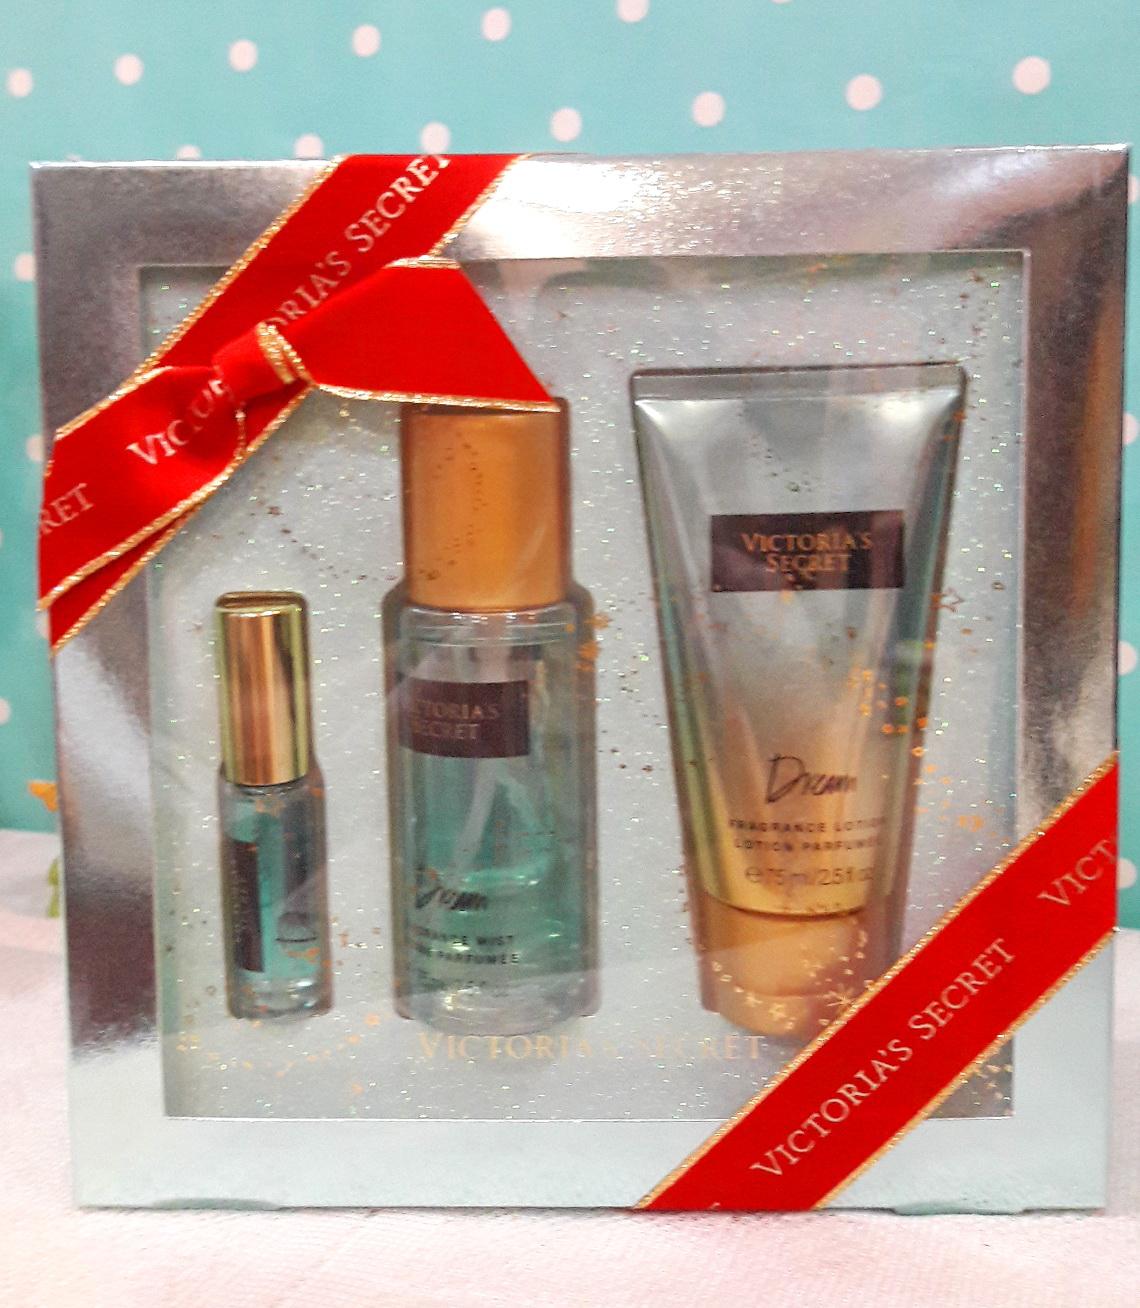 Victoria's Secret Gift Set 3 ชิ้น กลิ่น Aquar Kiss